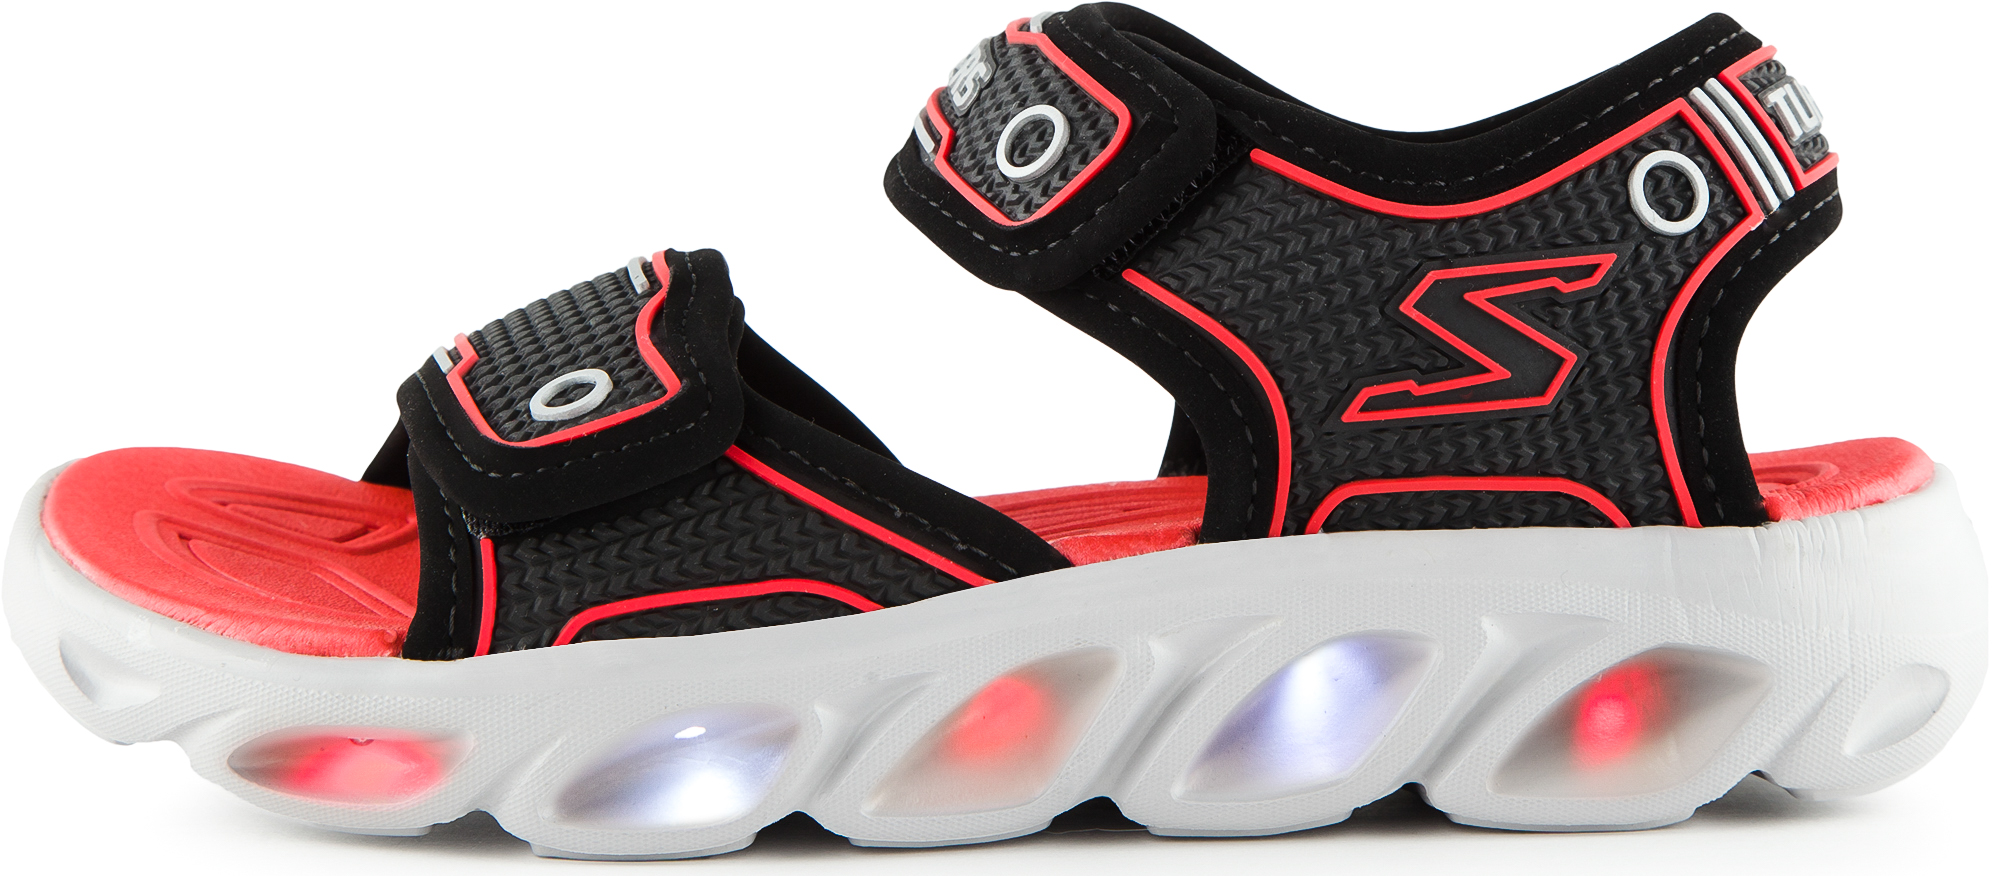 Skechers Сандалии для мальчиков Skechers Hypno-Splash, размер 37 обувь для мальчиков barkito krs18200